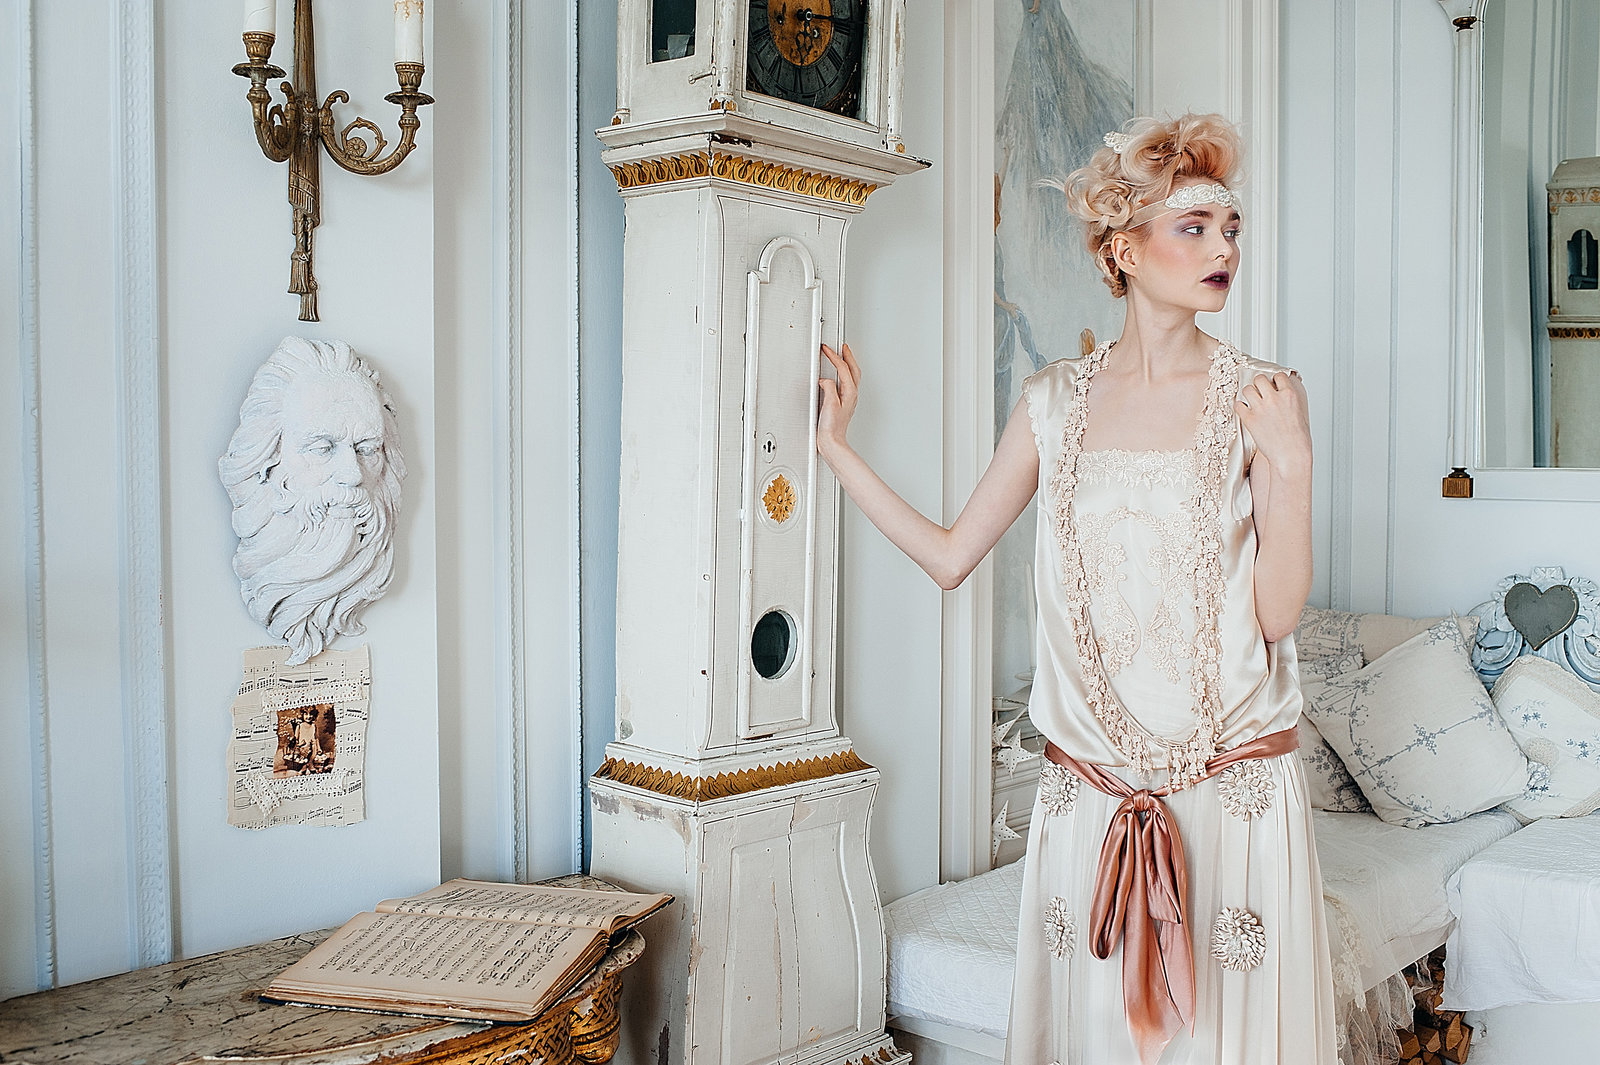 Marthe_1920s_style_flapper_wedding_dress_JoanneFlemingDesign (1)